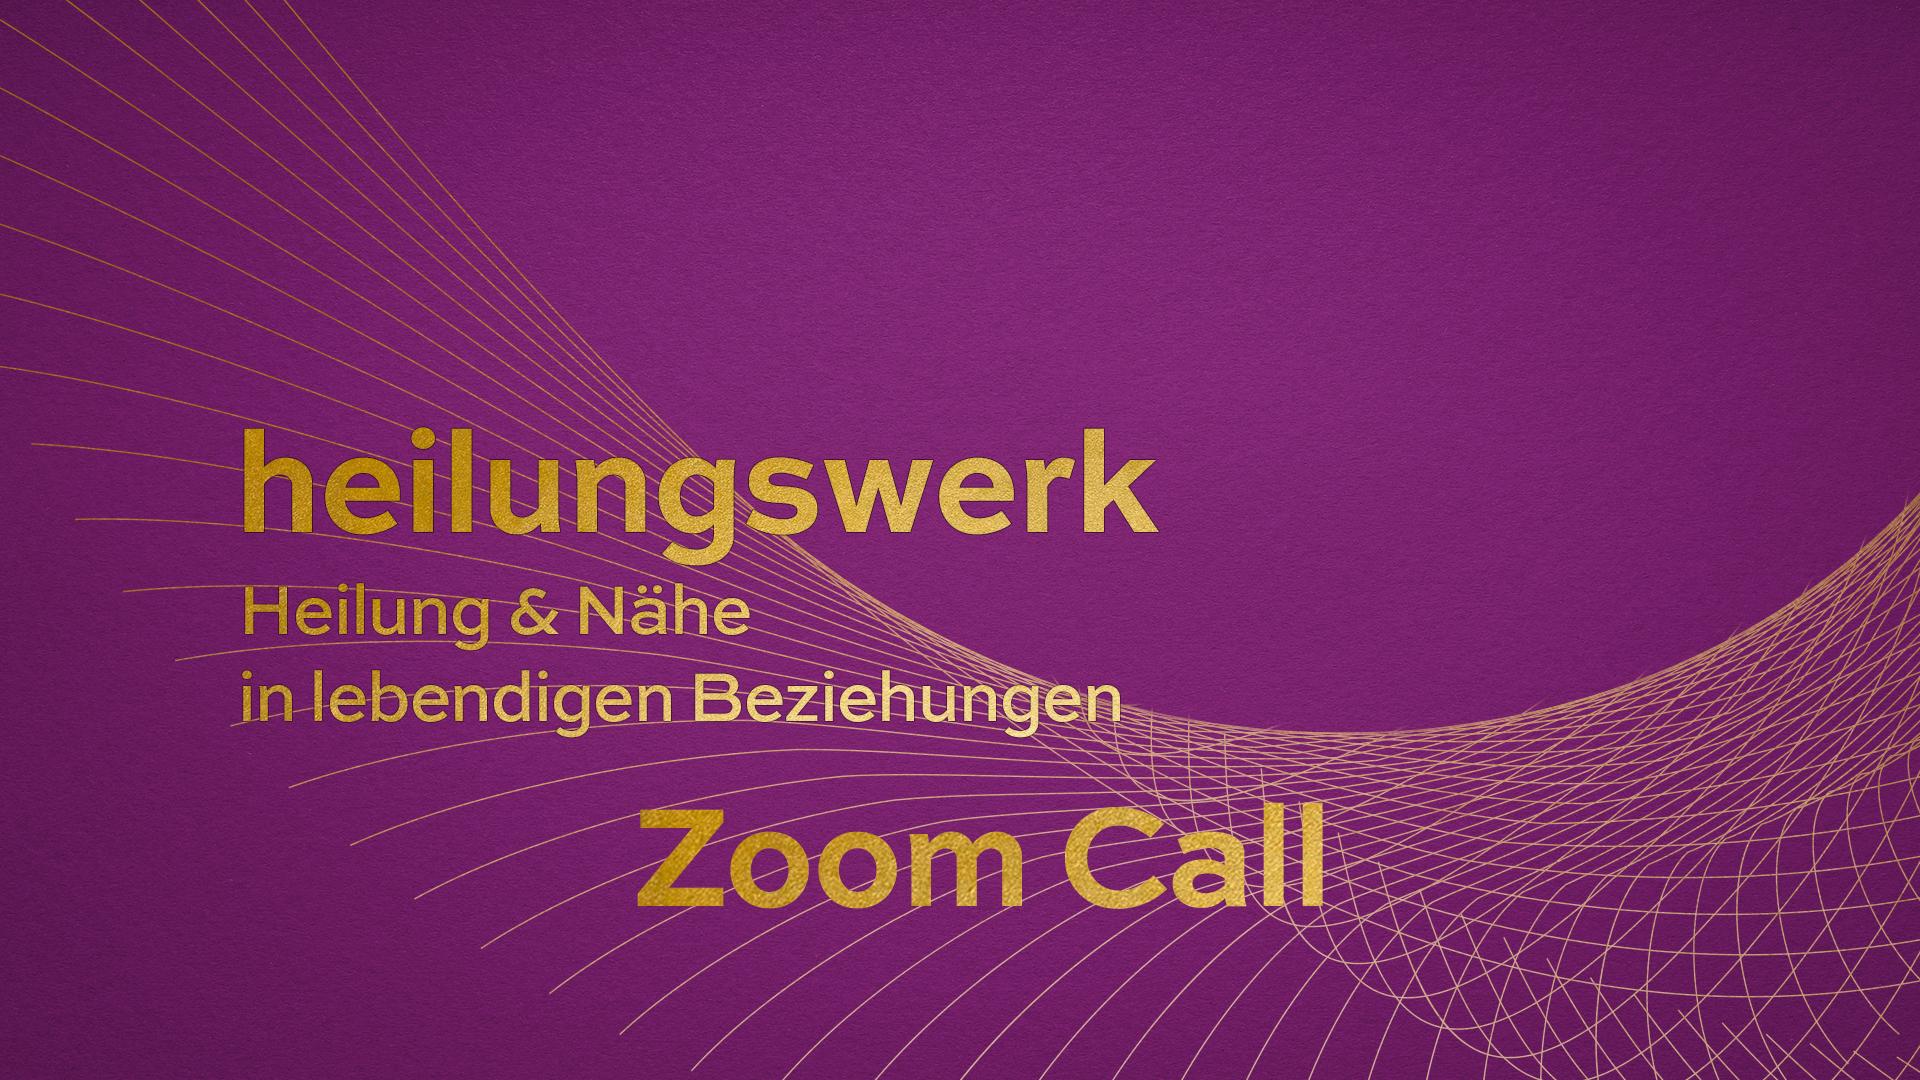 heilungswerk-kursbild-plakat-zoomcall